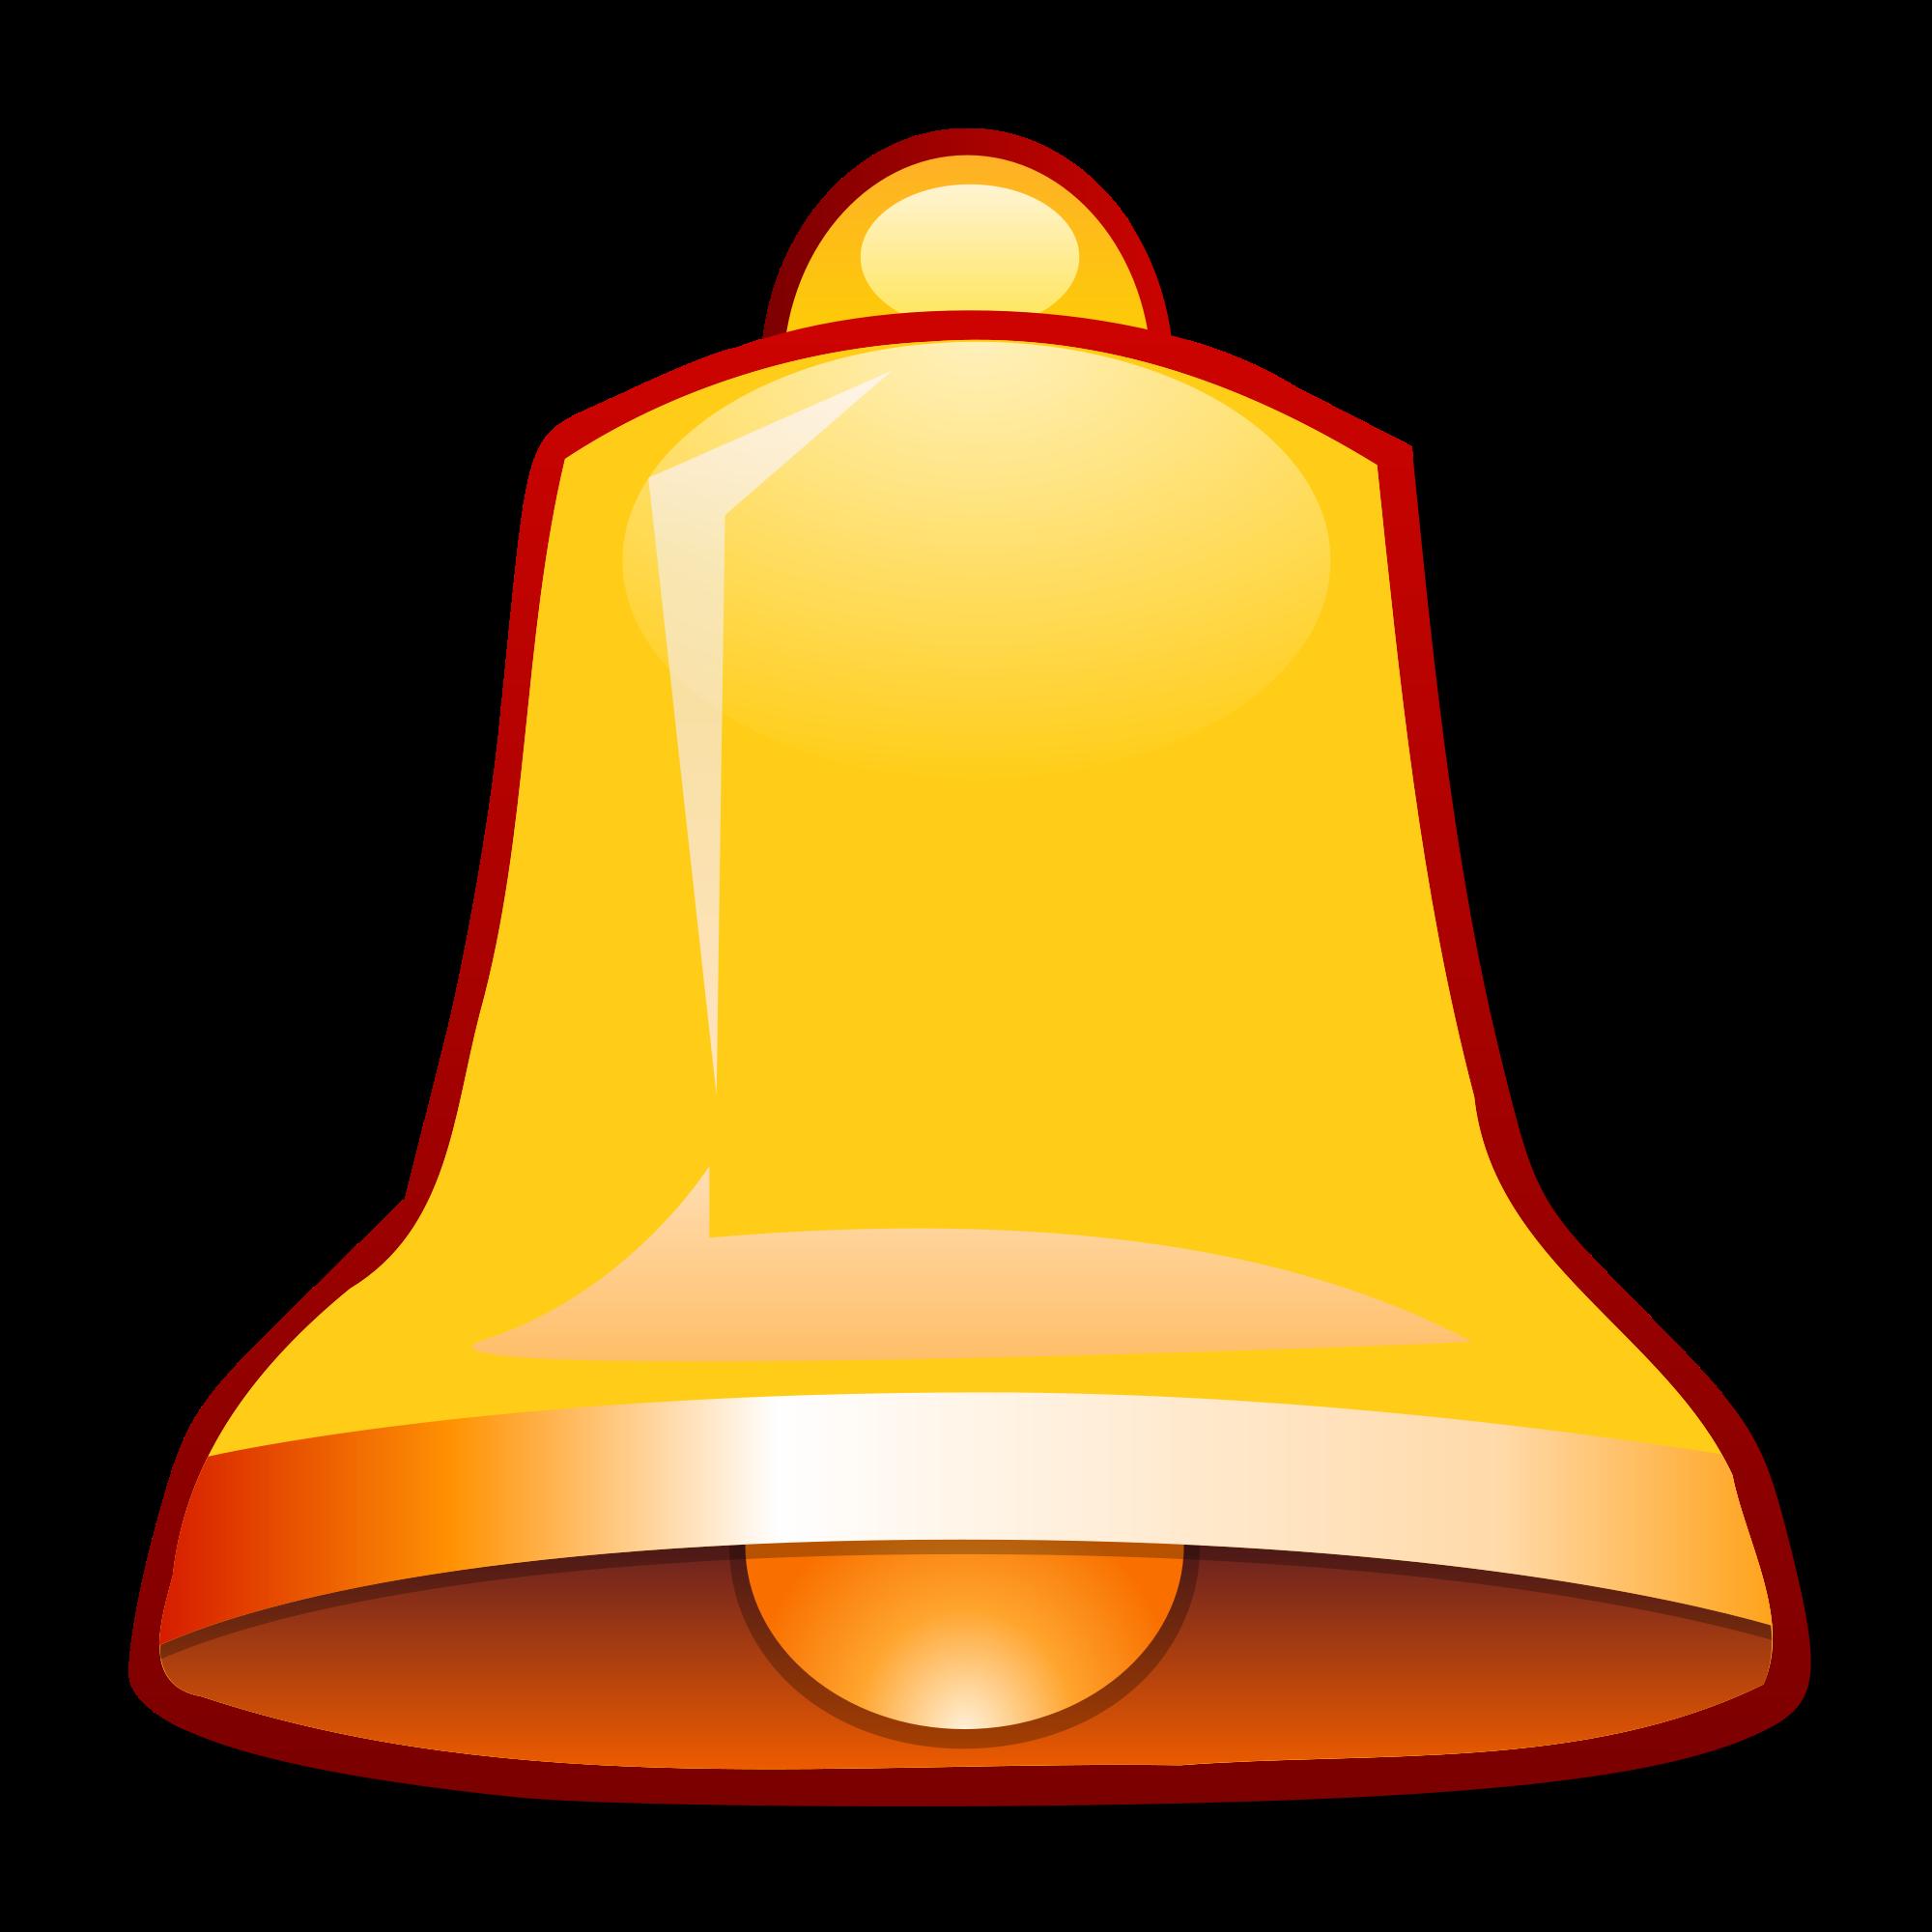 bell clipart transparent background